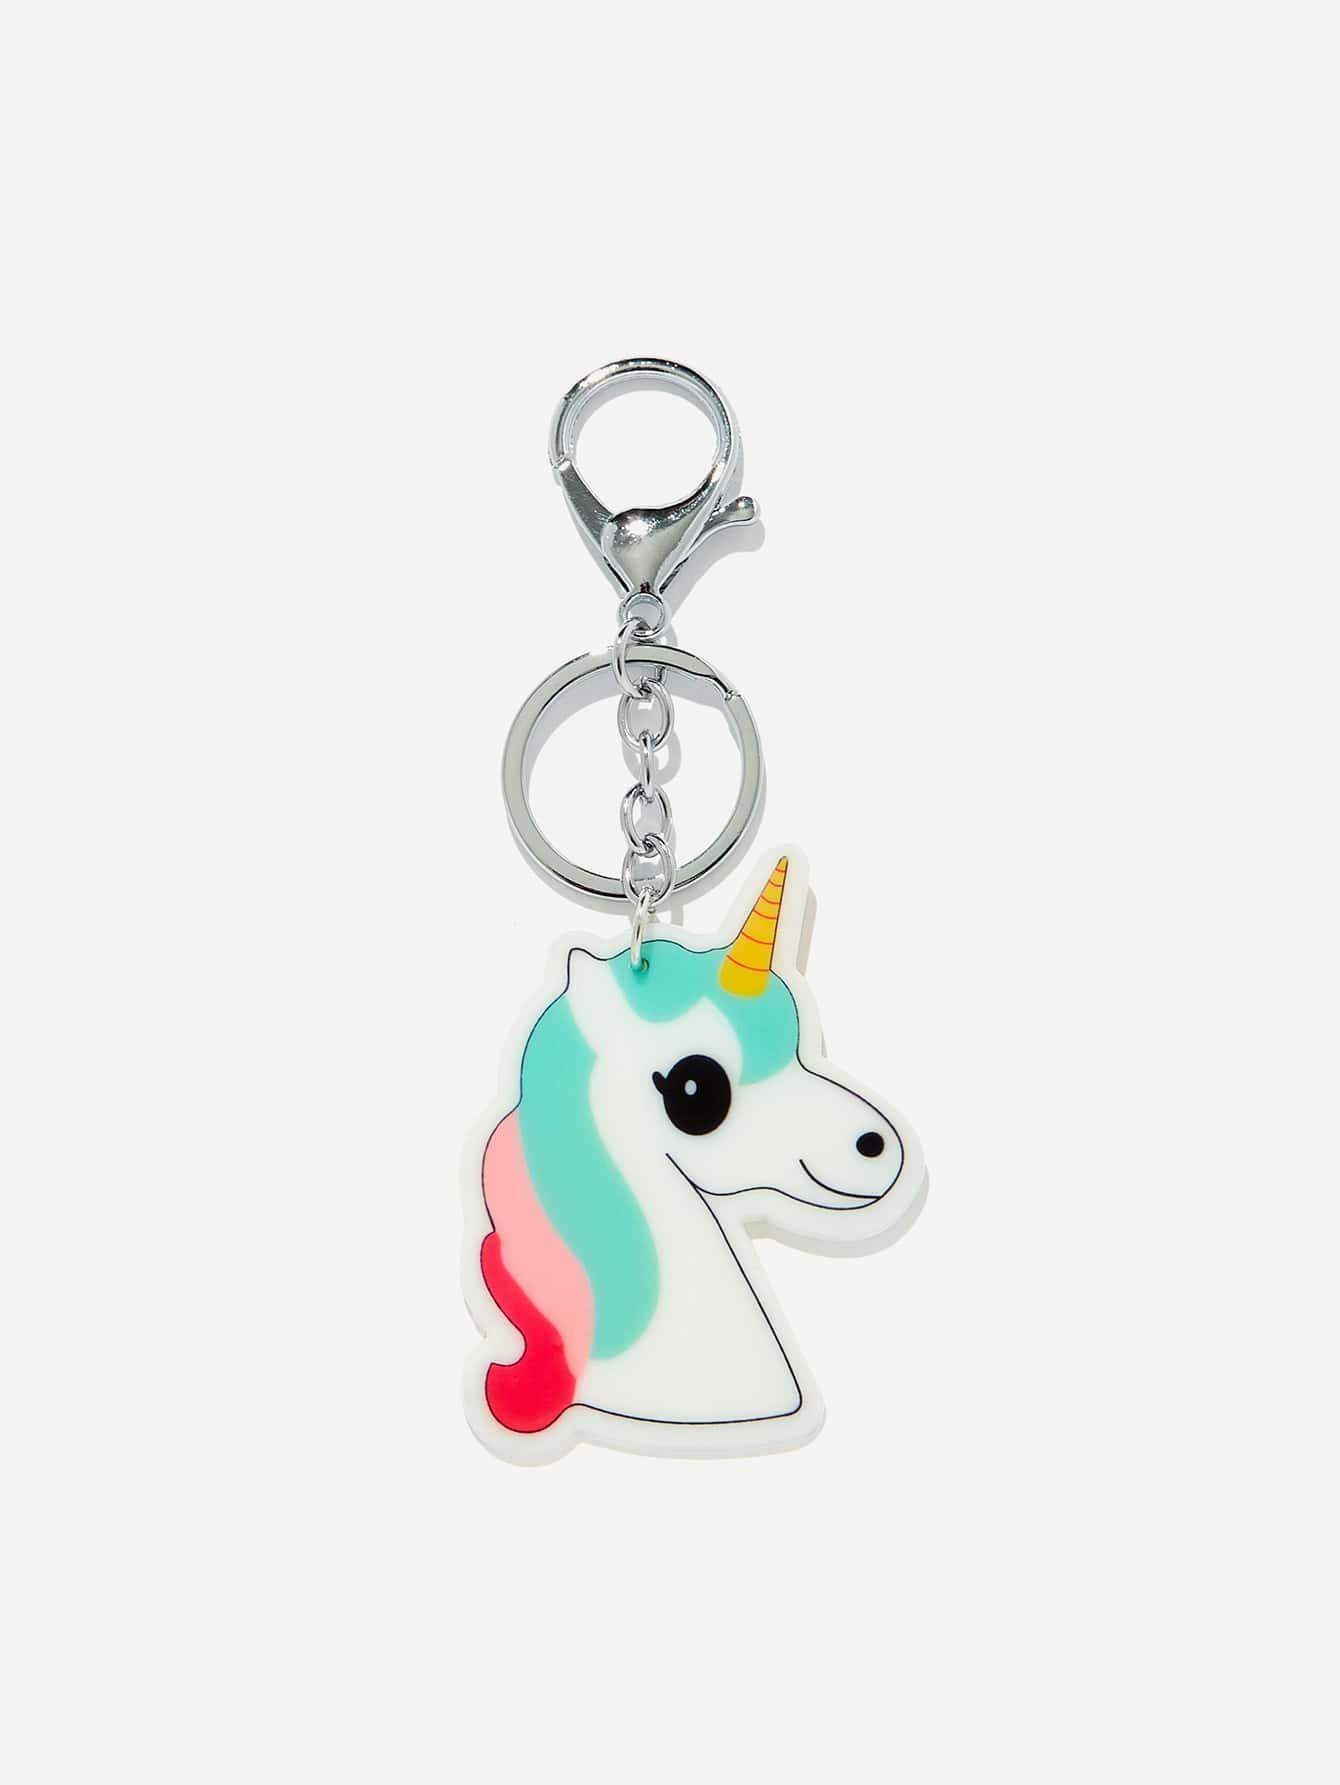 Unicorn Shaped Keychain